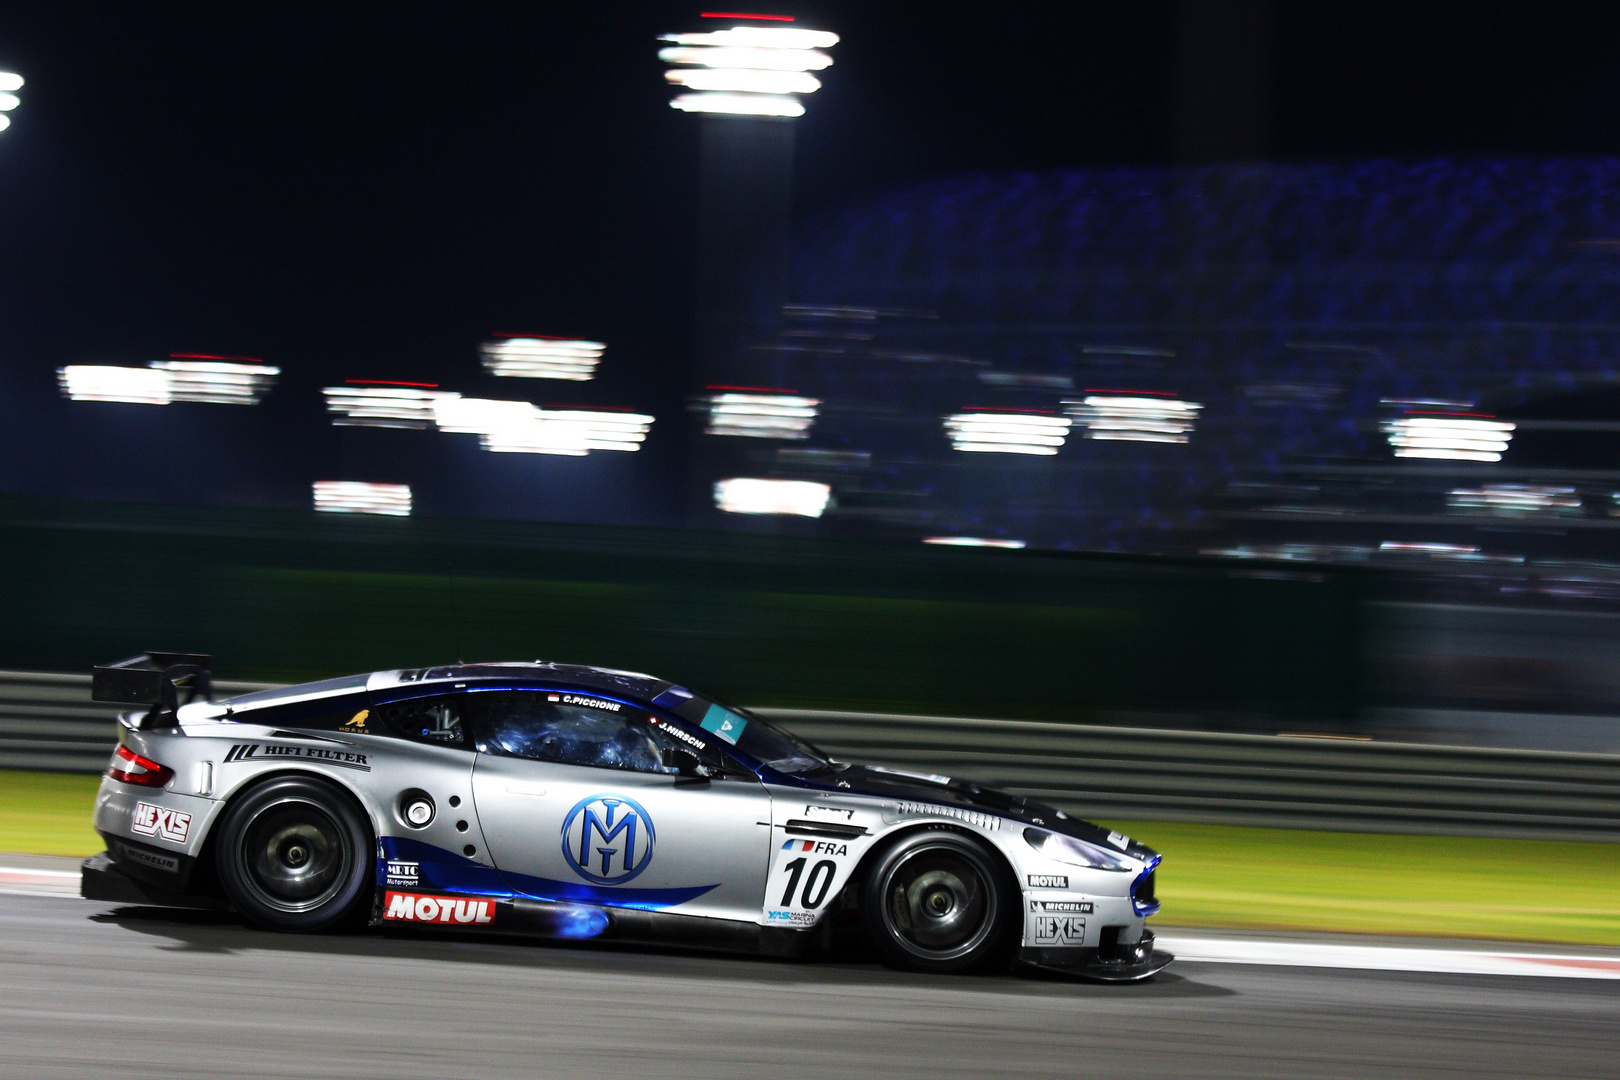 Hexis Racing AMR Aston Martin DBR9